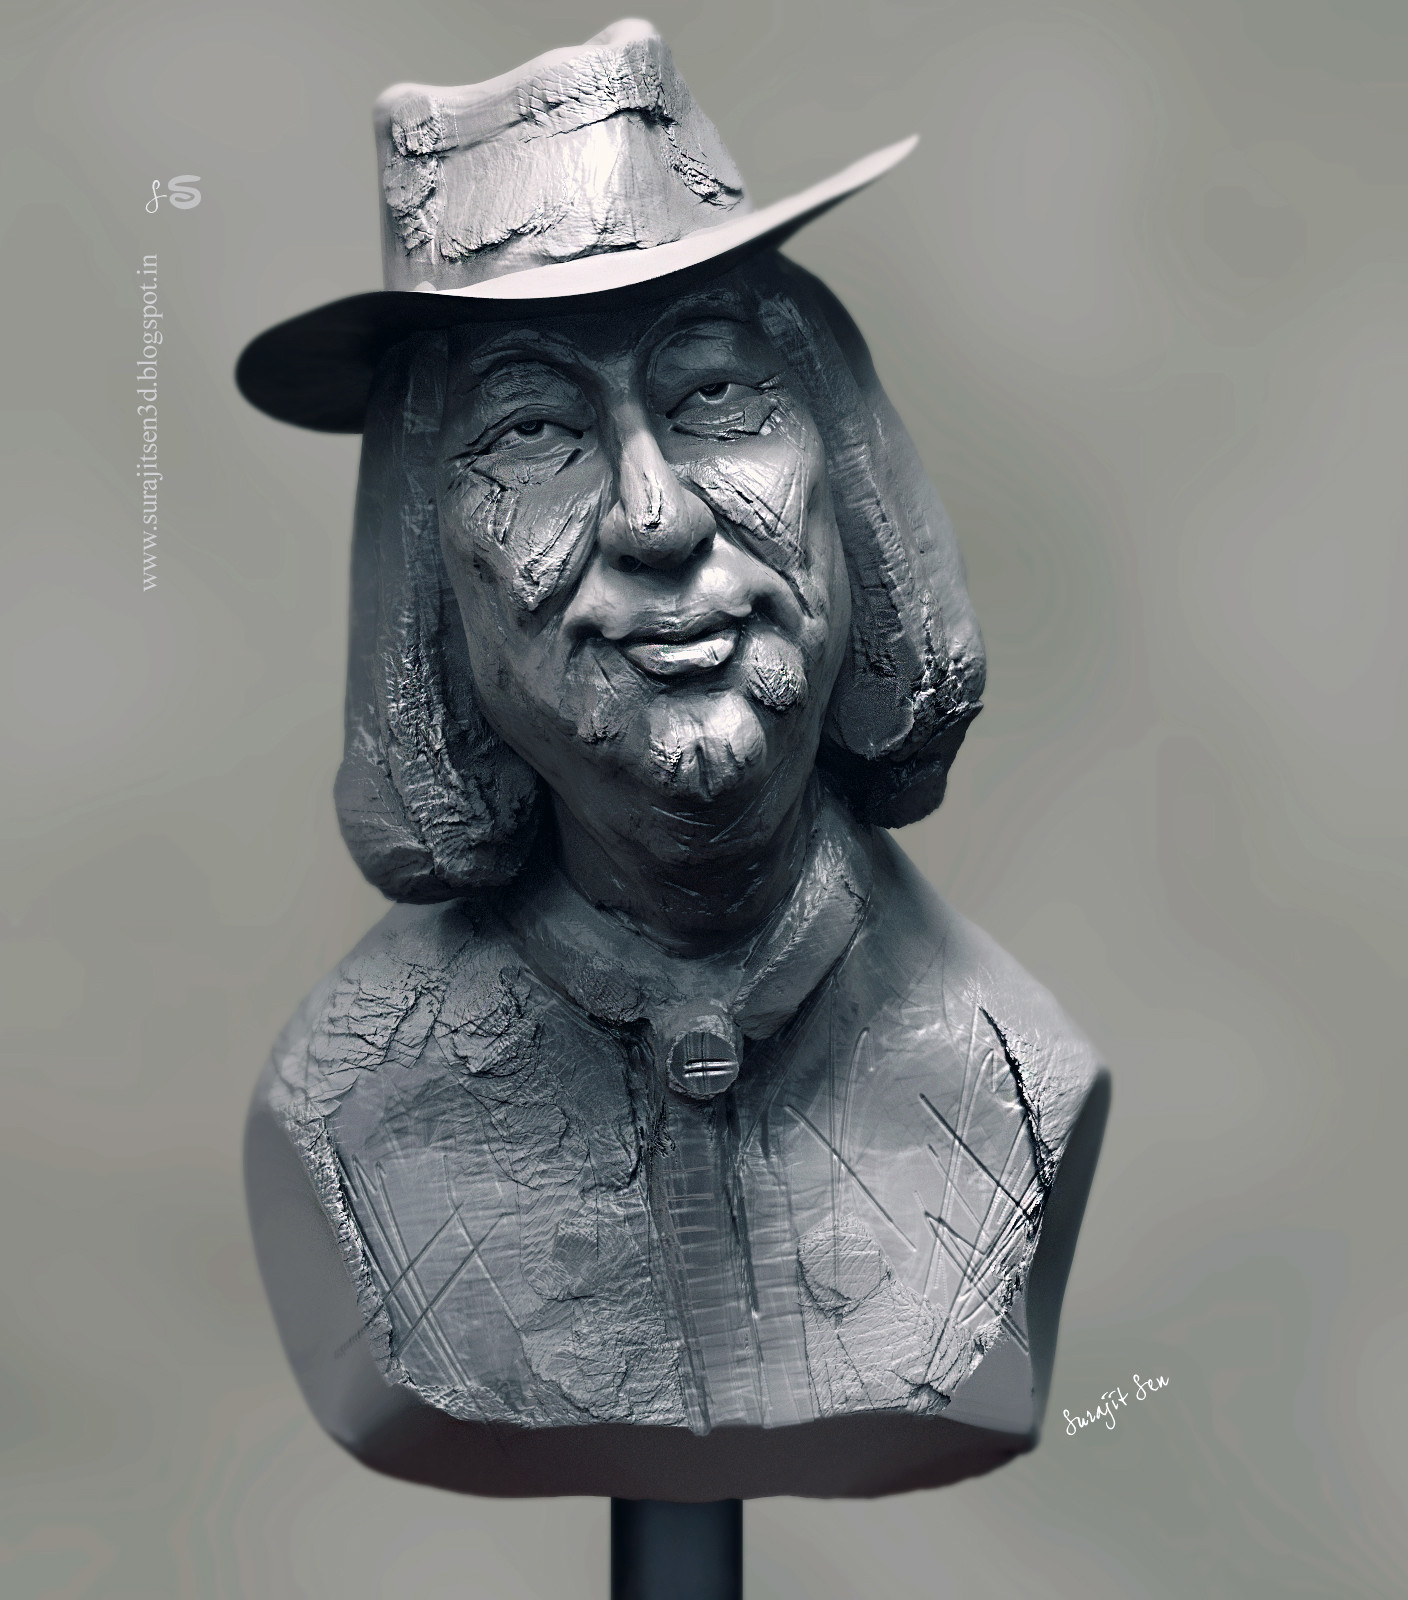 Surajit sen thai man quick sculpt by surajitsen